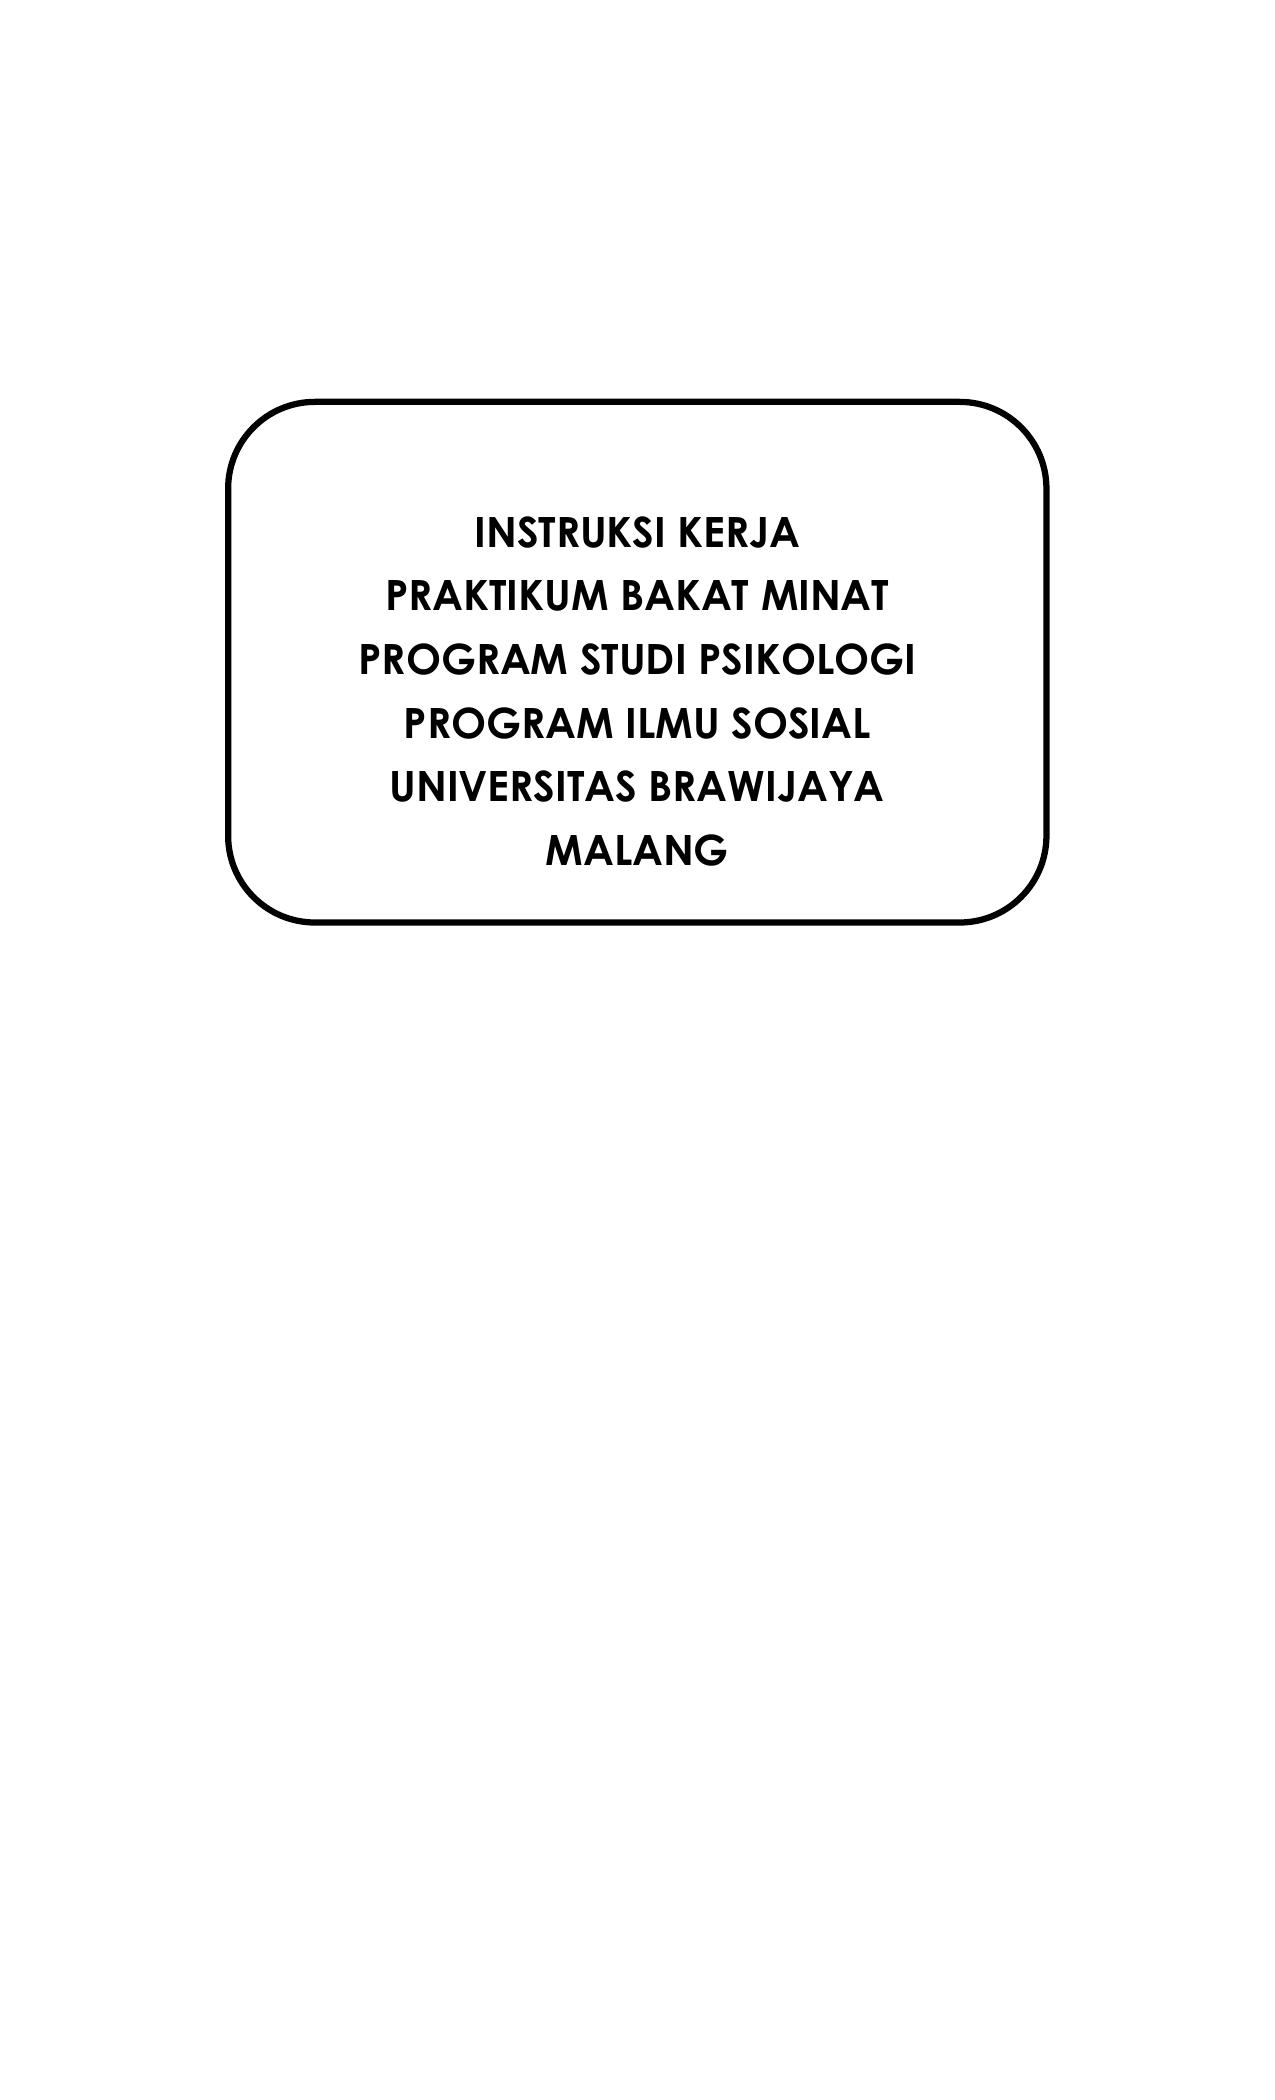 Ist Universitas Brawijaya